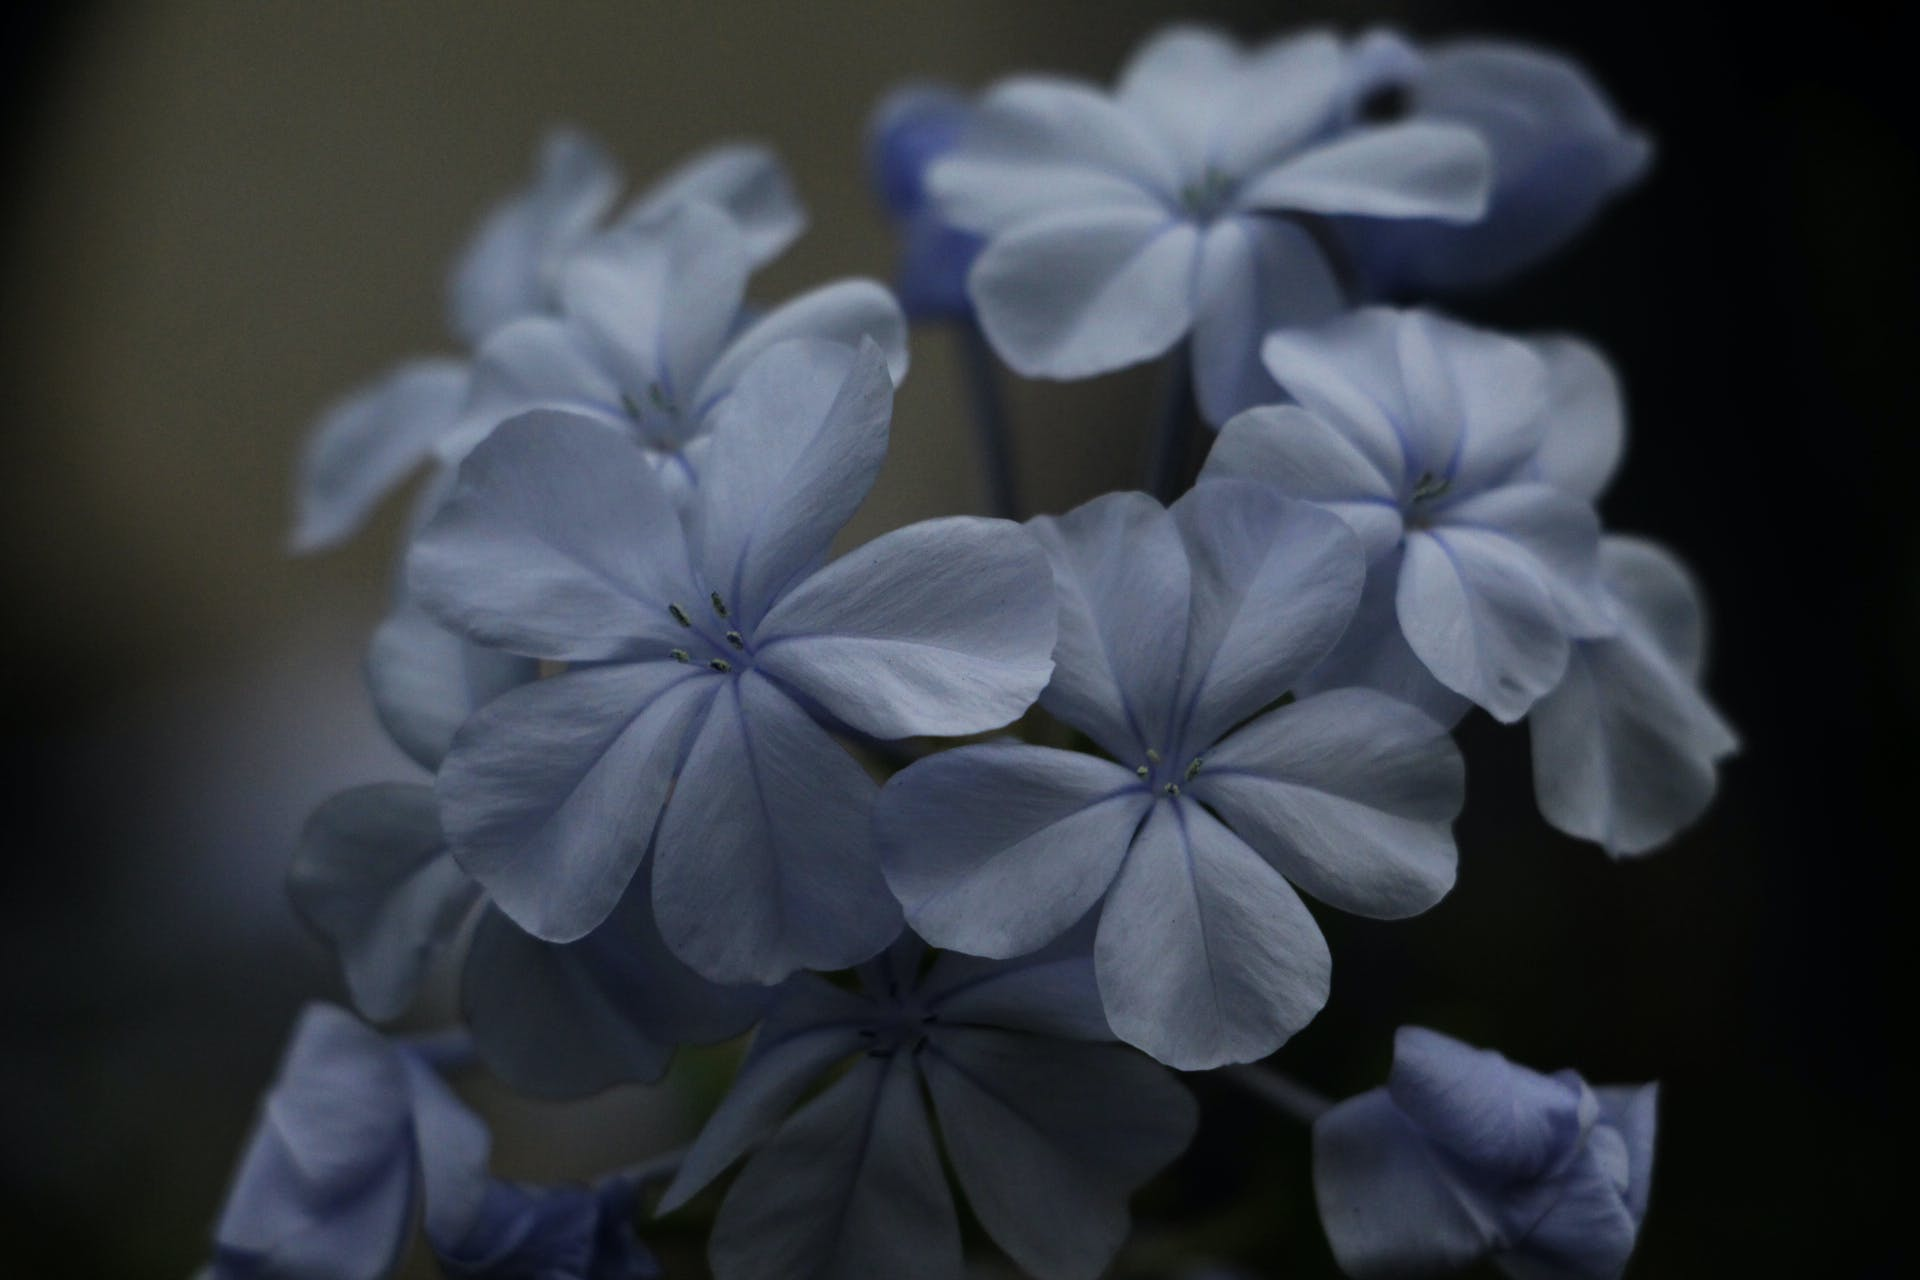 Free stock photo of flowers, white flowers, beautiful flowers